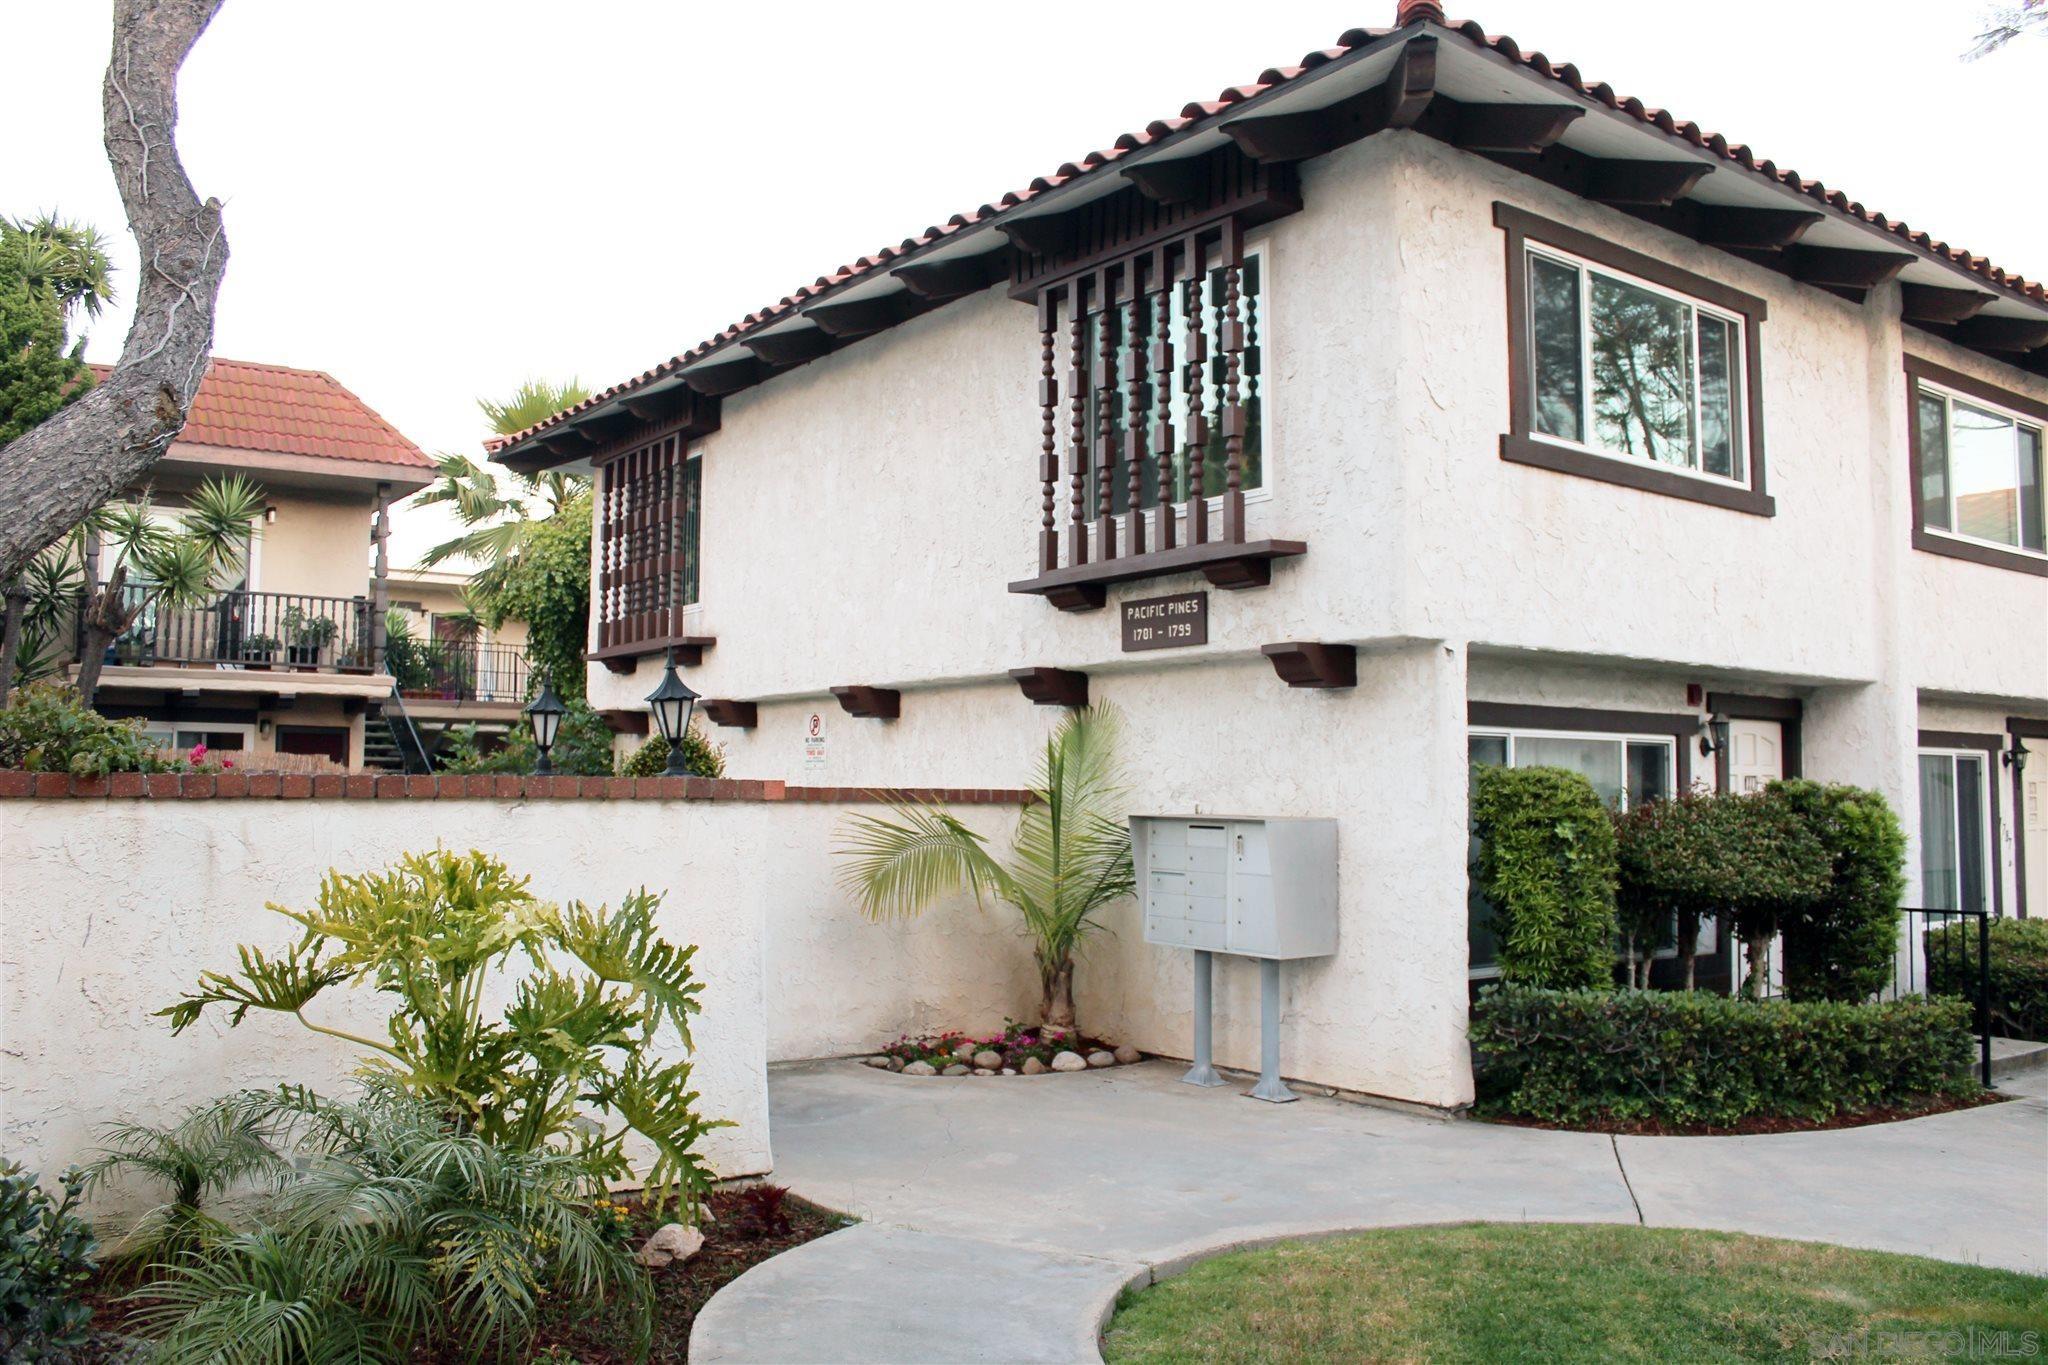 Main Photo: PACIFIC BEACH Condo for sale : 2 bedrooms : 1789 Missouri in San Diego